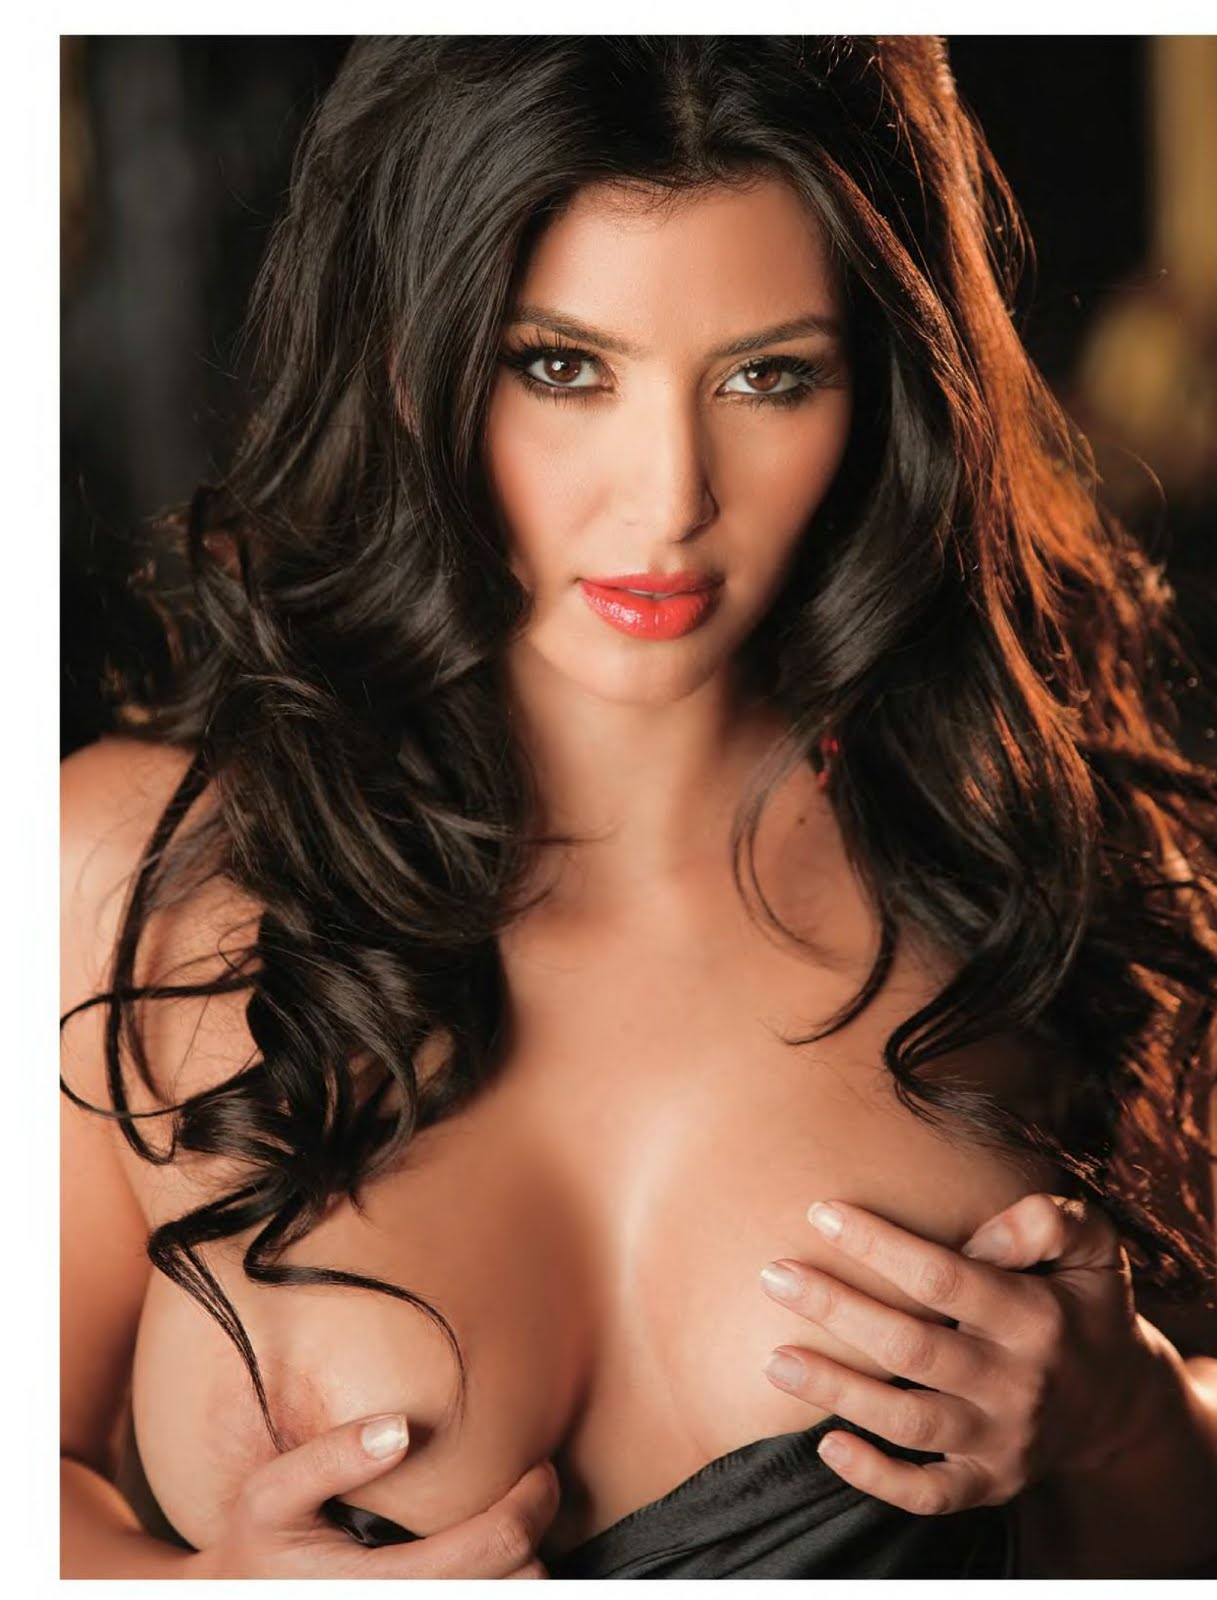 Devils Kim Kardashian Playboy-5696